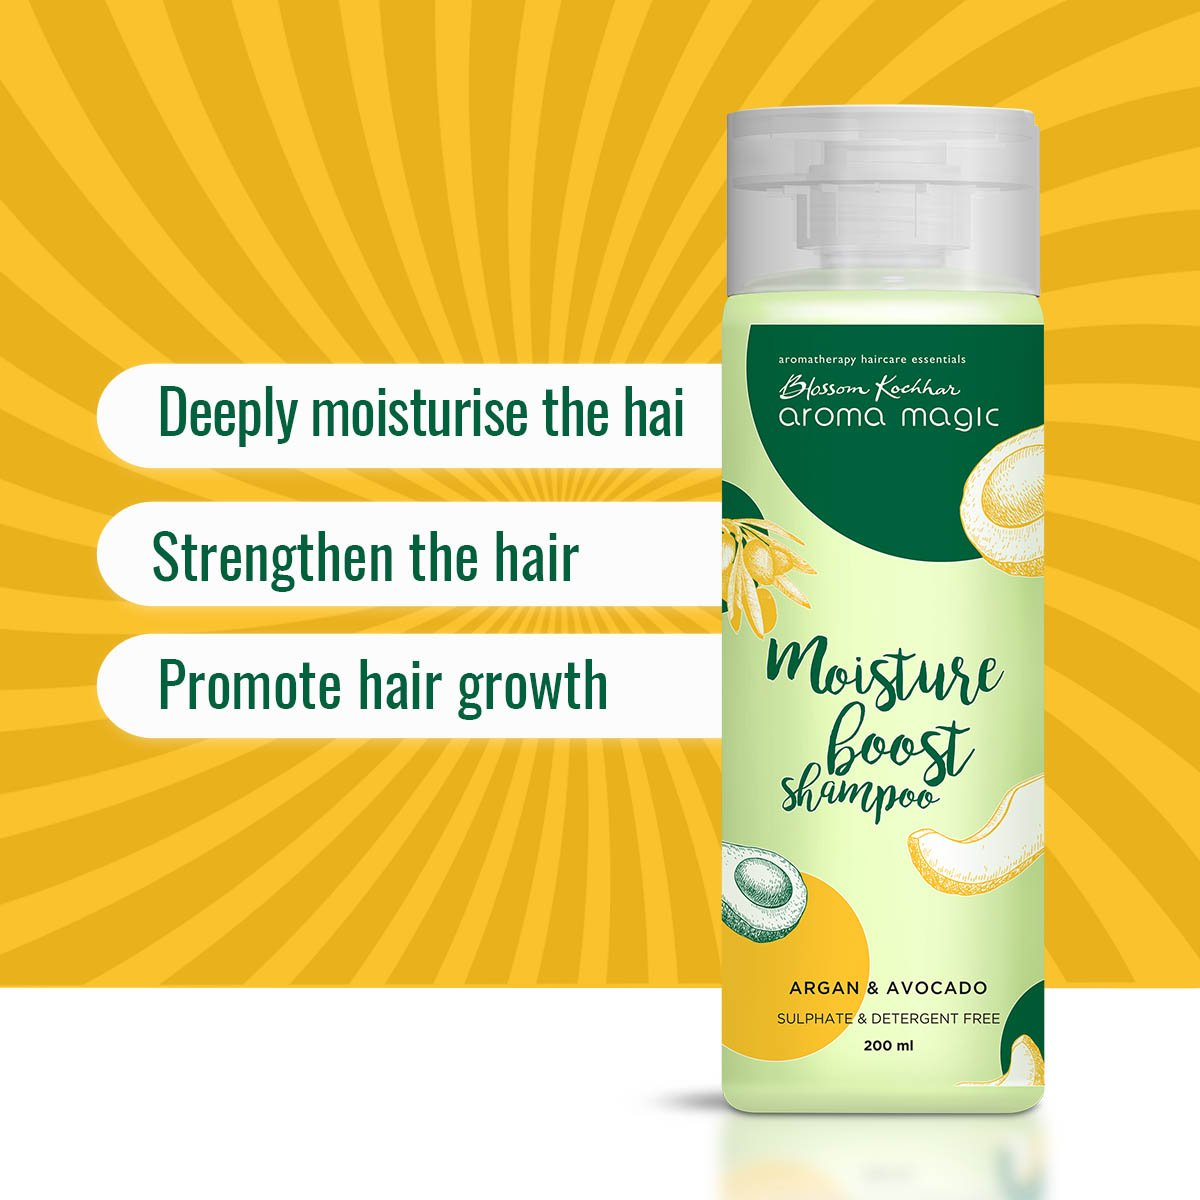 Moisture_boost_shampoo_4_2000x